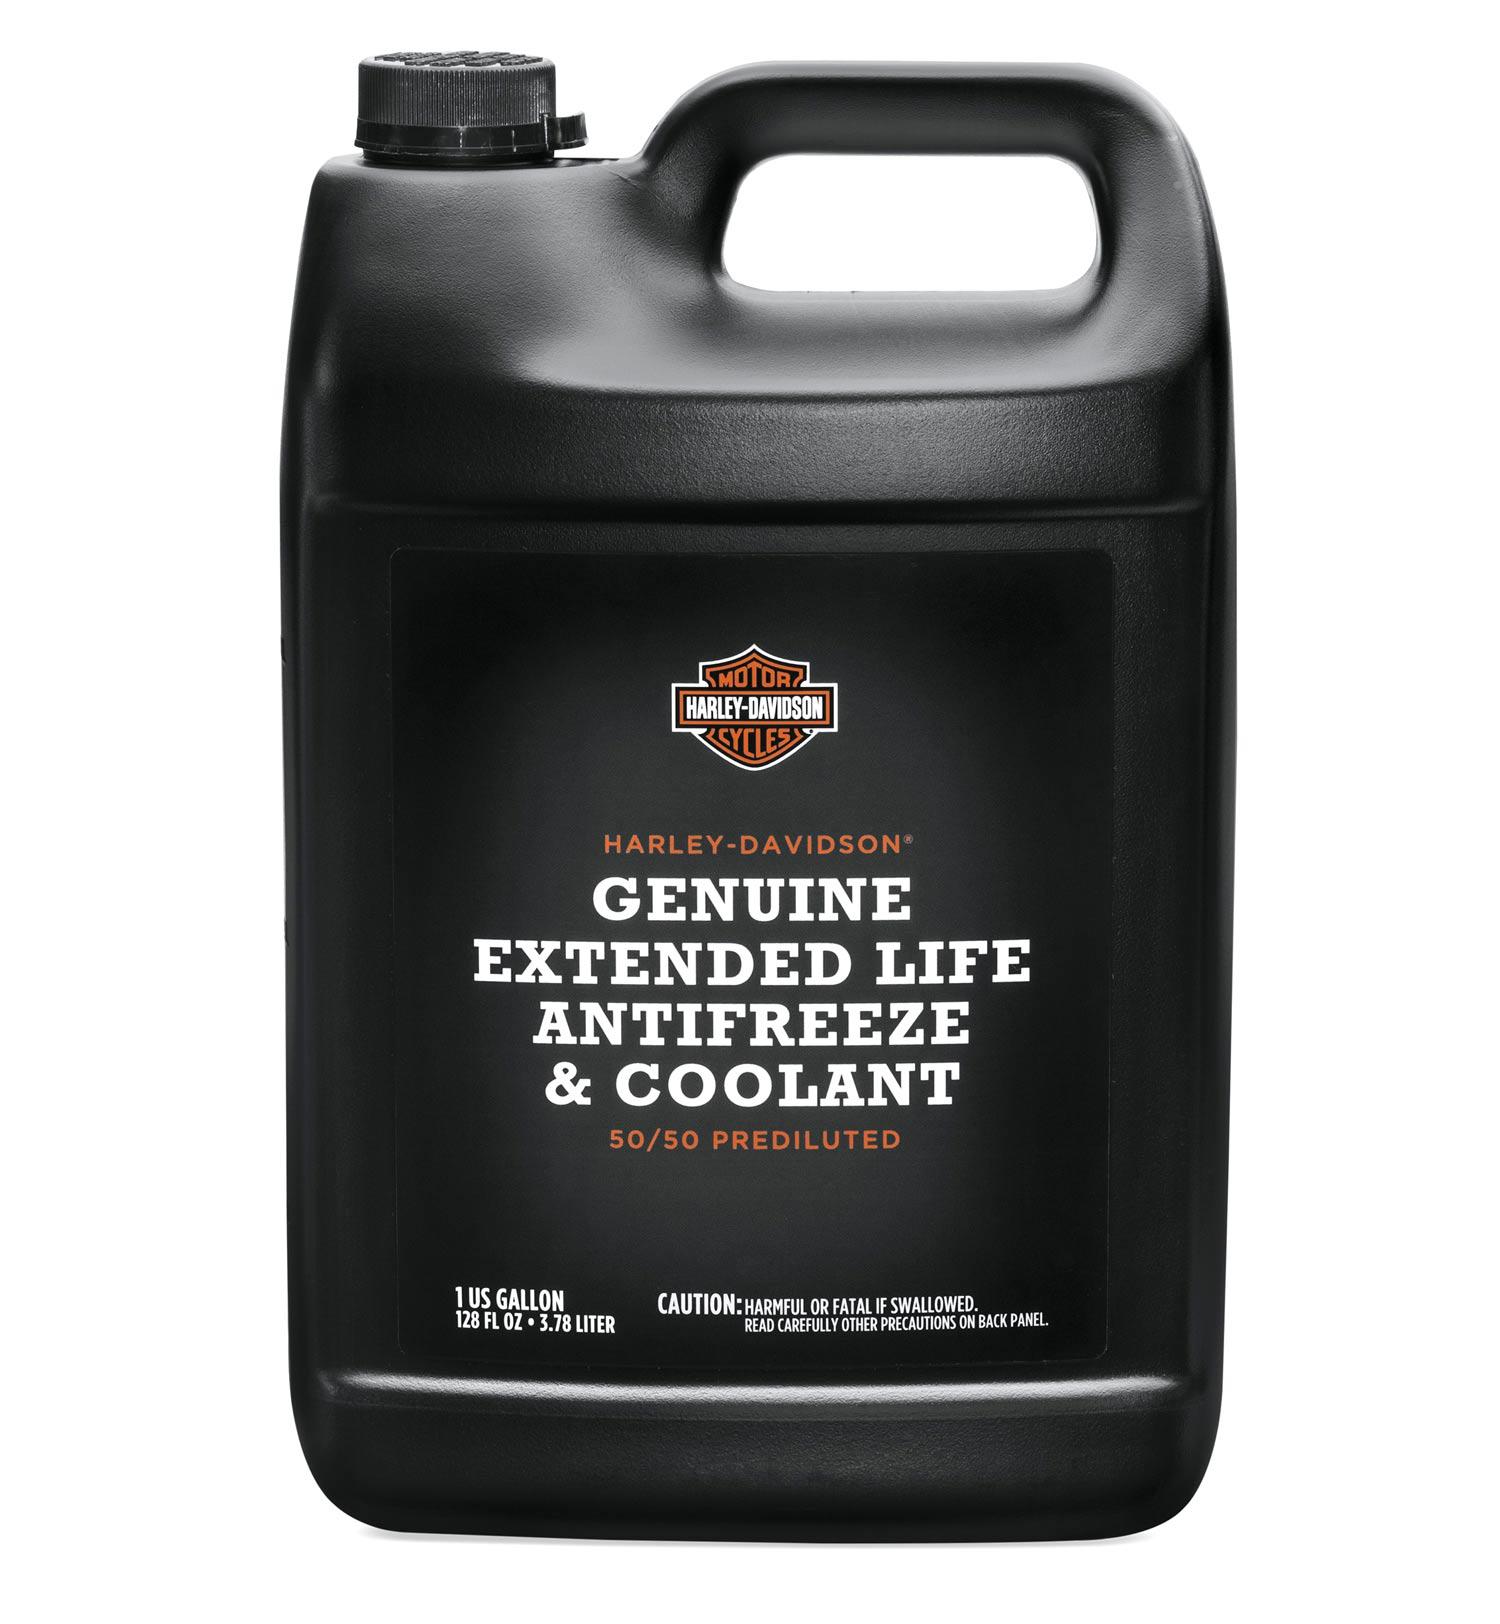 Harley-Davidson Genuine Harley-Davidson Extended Life Antifreeze and Coolant  - 99822-02